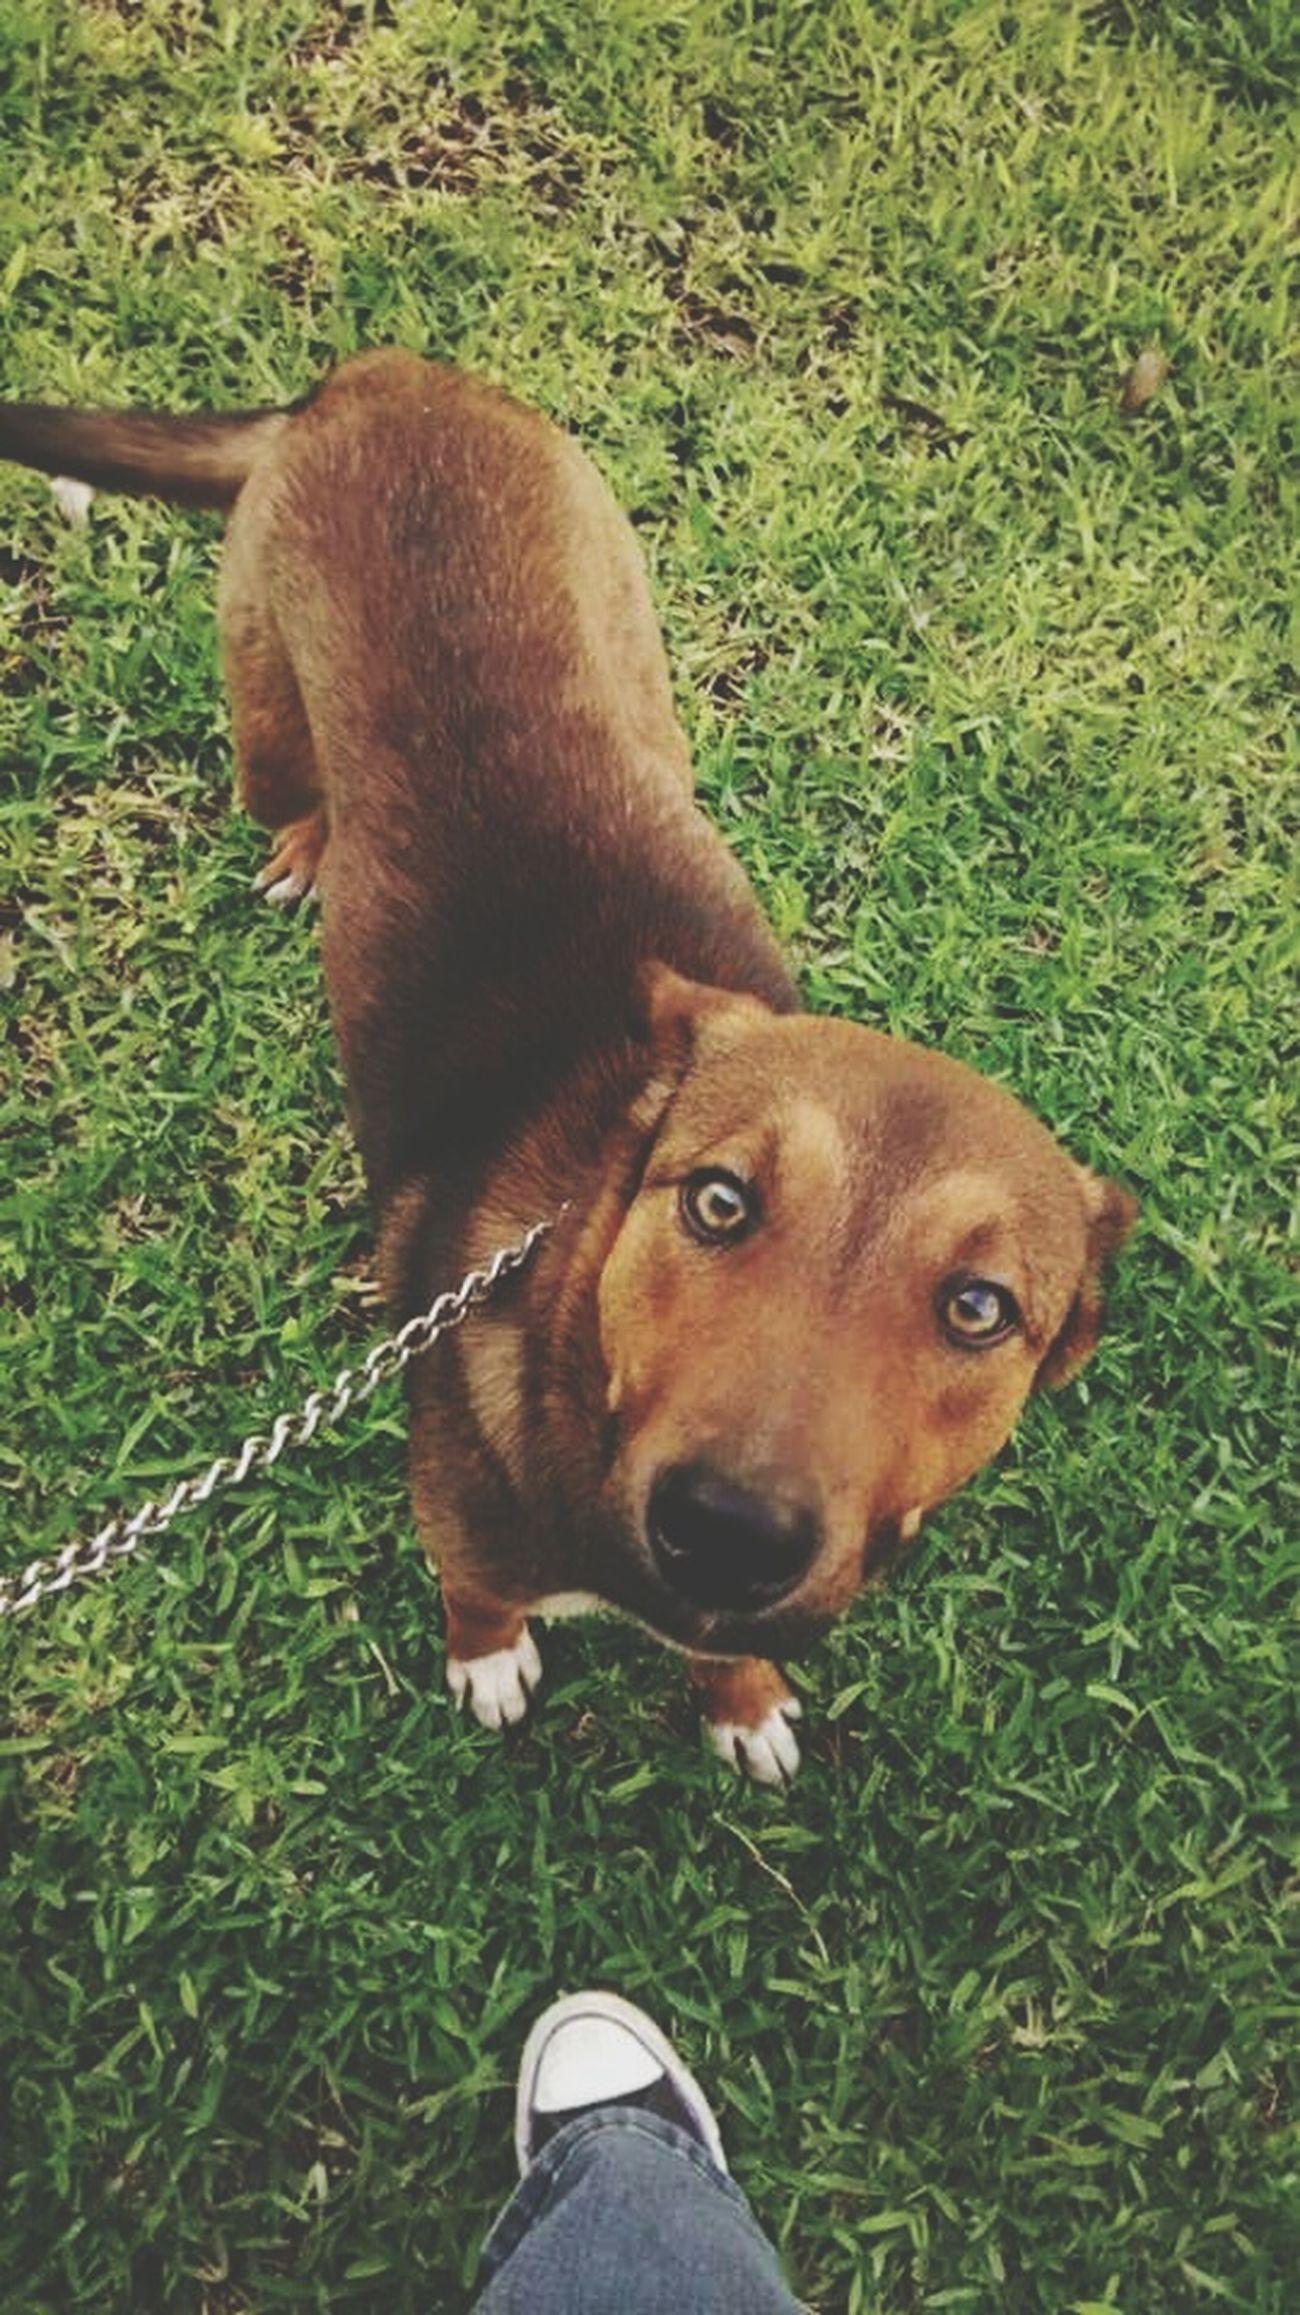 Me Enamore De Sus Ojos ❤️👌☺️ Doggie Mi Bebesito